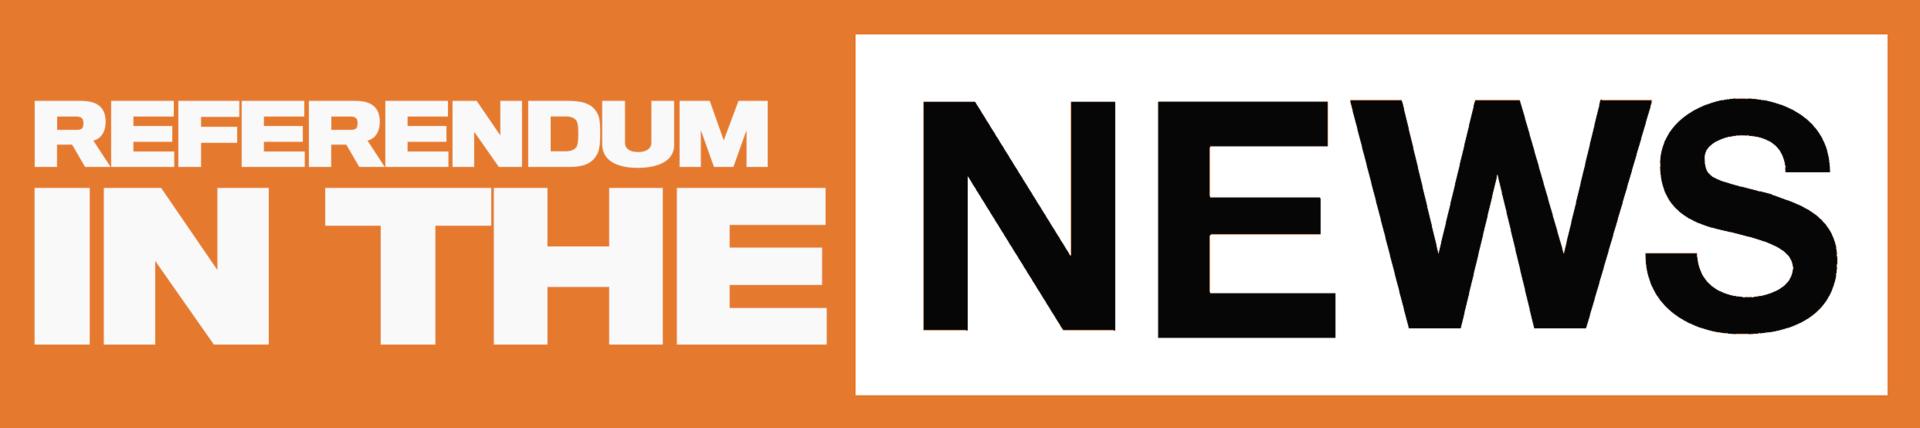 intthenews